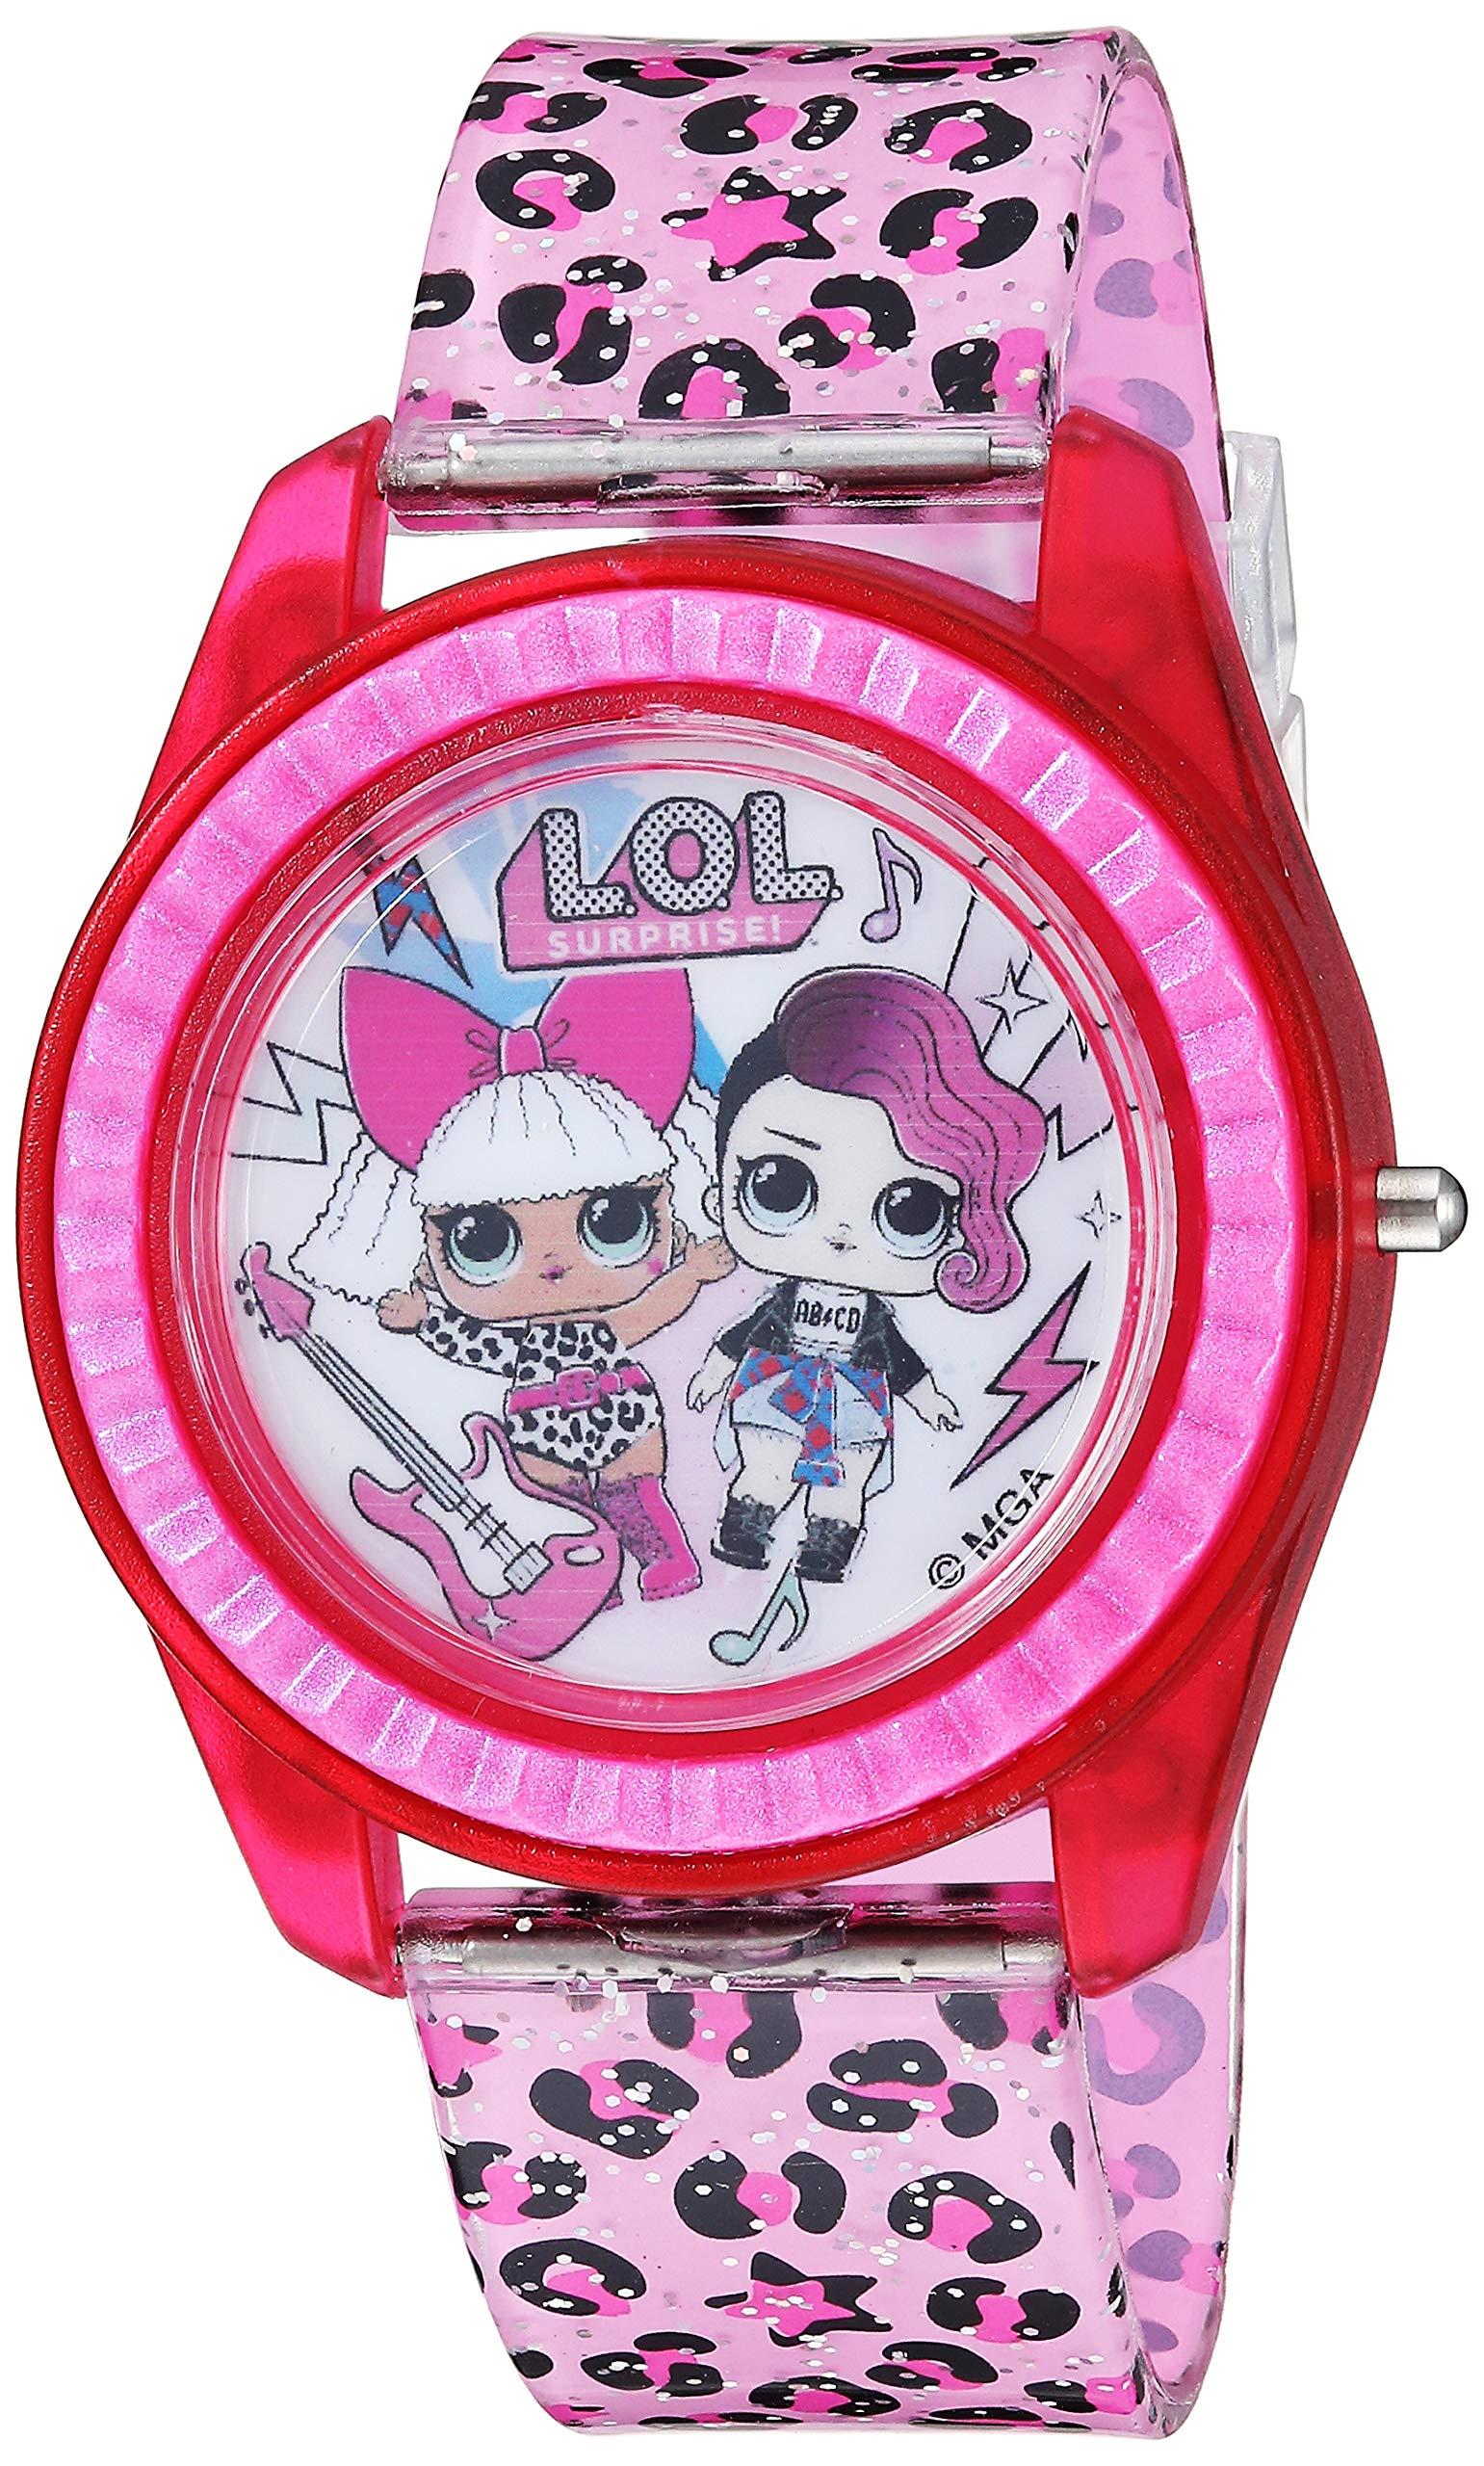 L.O.L. Surprise! Girls' Quartz Watch with Plastic Strap, Pink, 17.6 (Model: LOL4000) by L.O.L. Surprise!